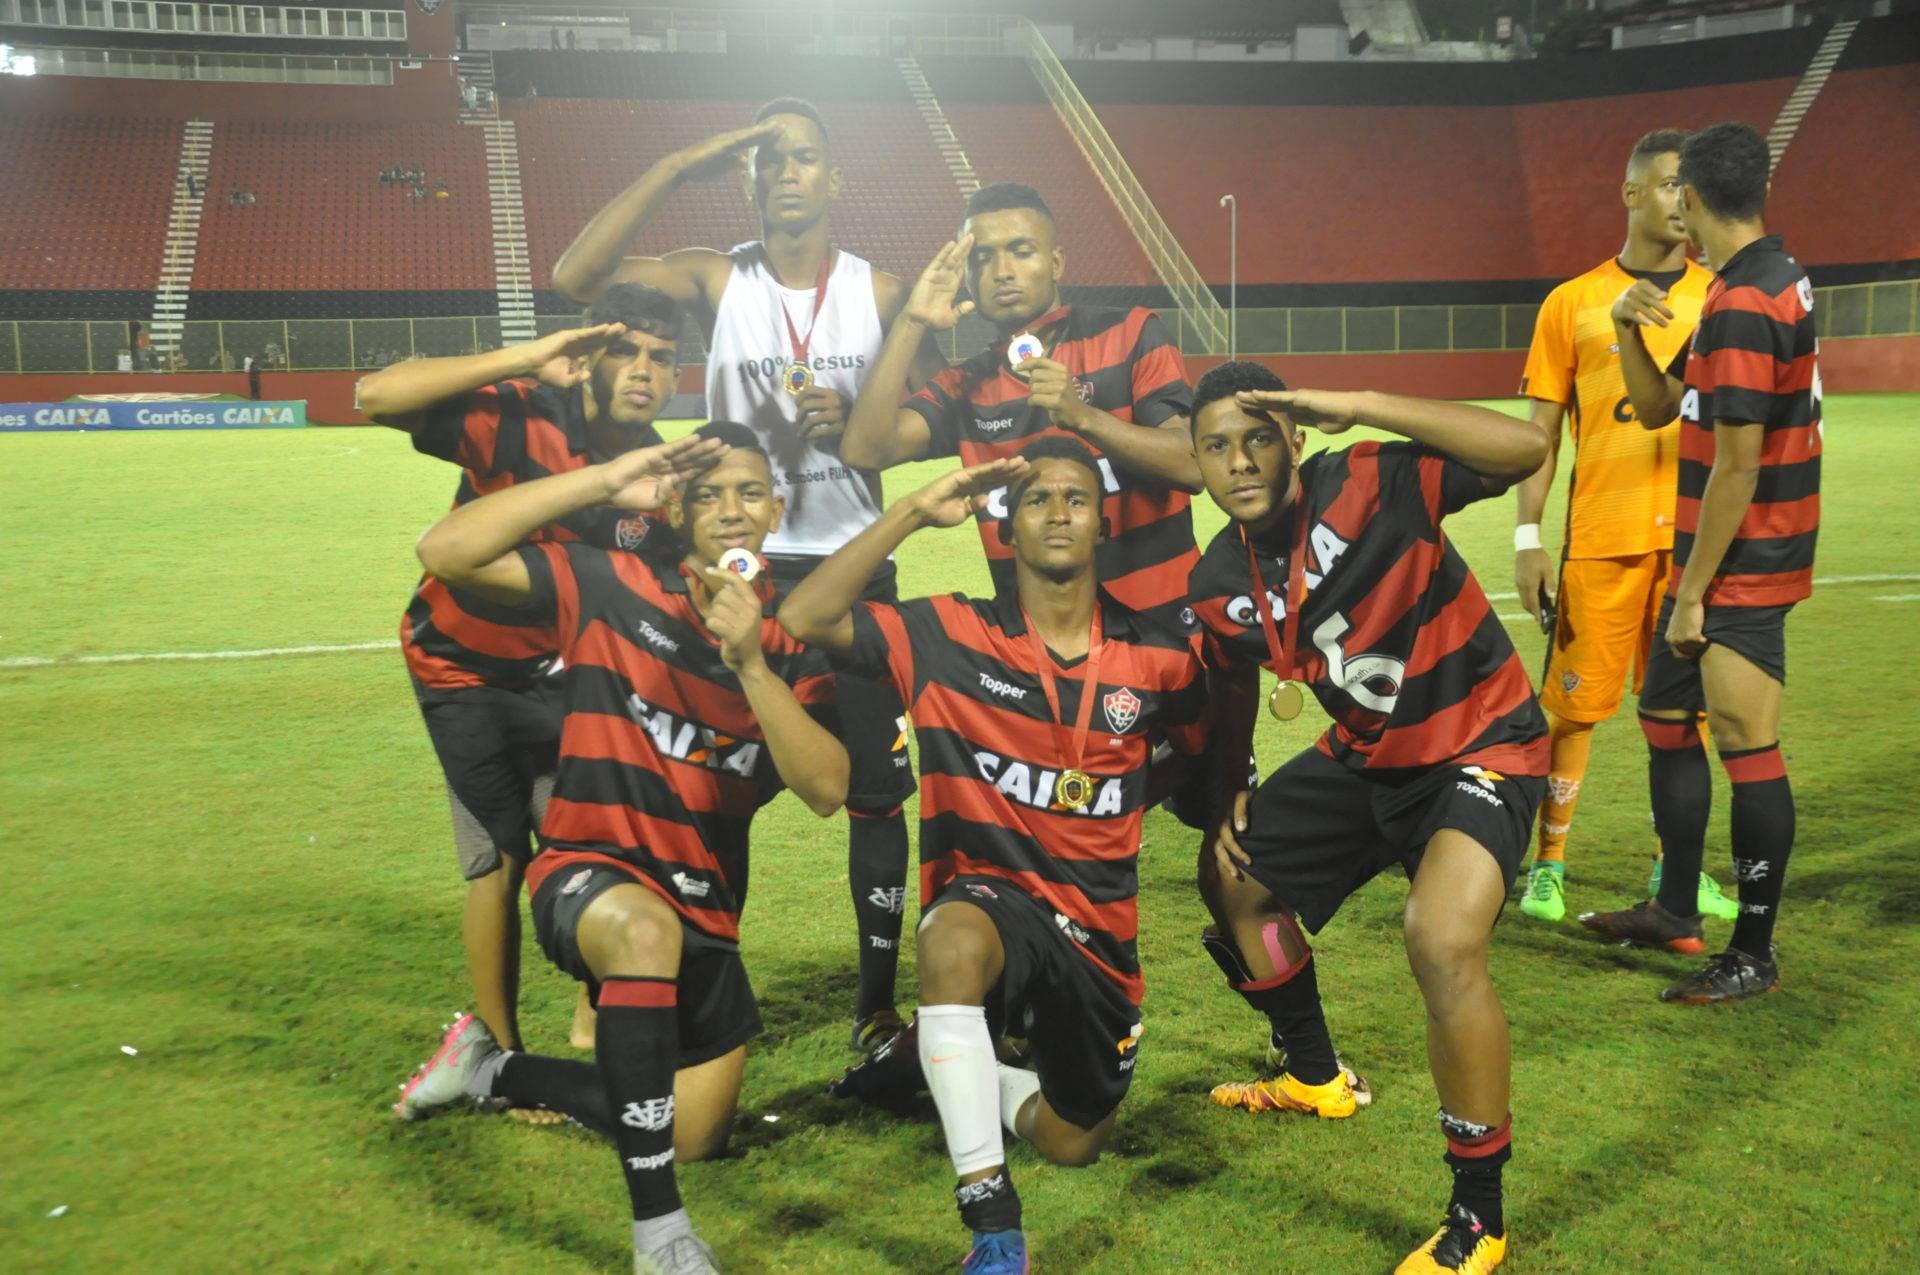 BASE MODIFICADA   Esporte Clube Vitória - Site Oficial 5b8cdbf0aeec0